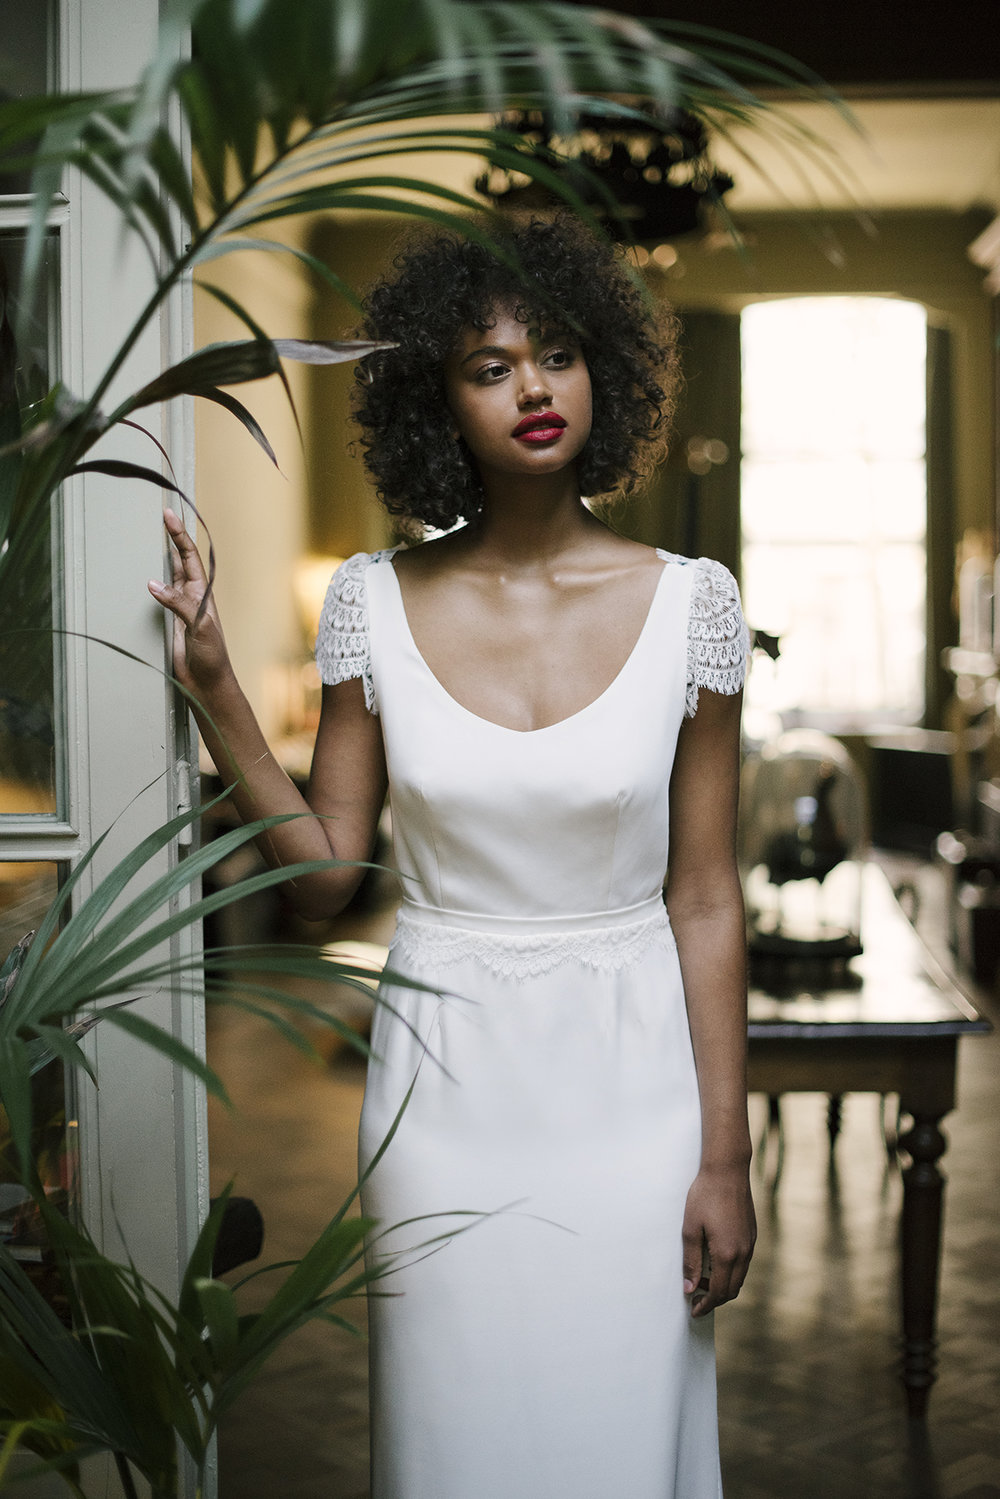 valentine-avoh-robe-mariee-dinah-dentelle-calais--wedding-dress-bruxelles-photo-elodie-timmermans-32.jpg